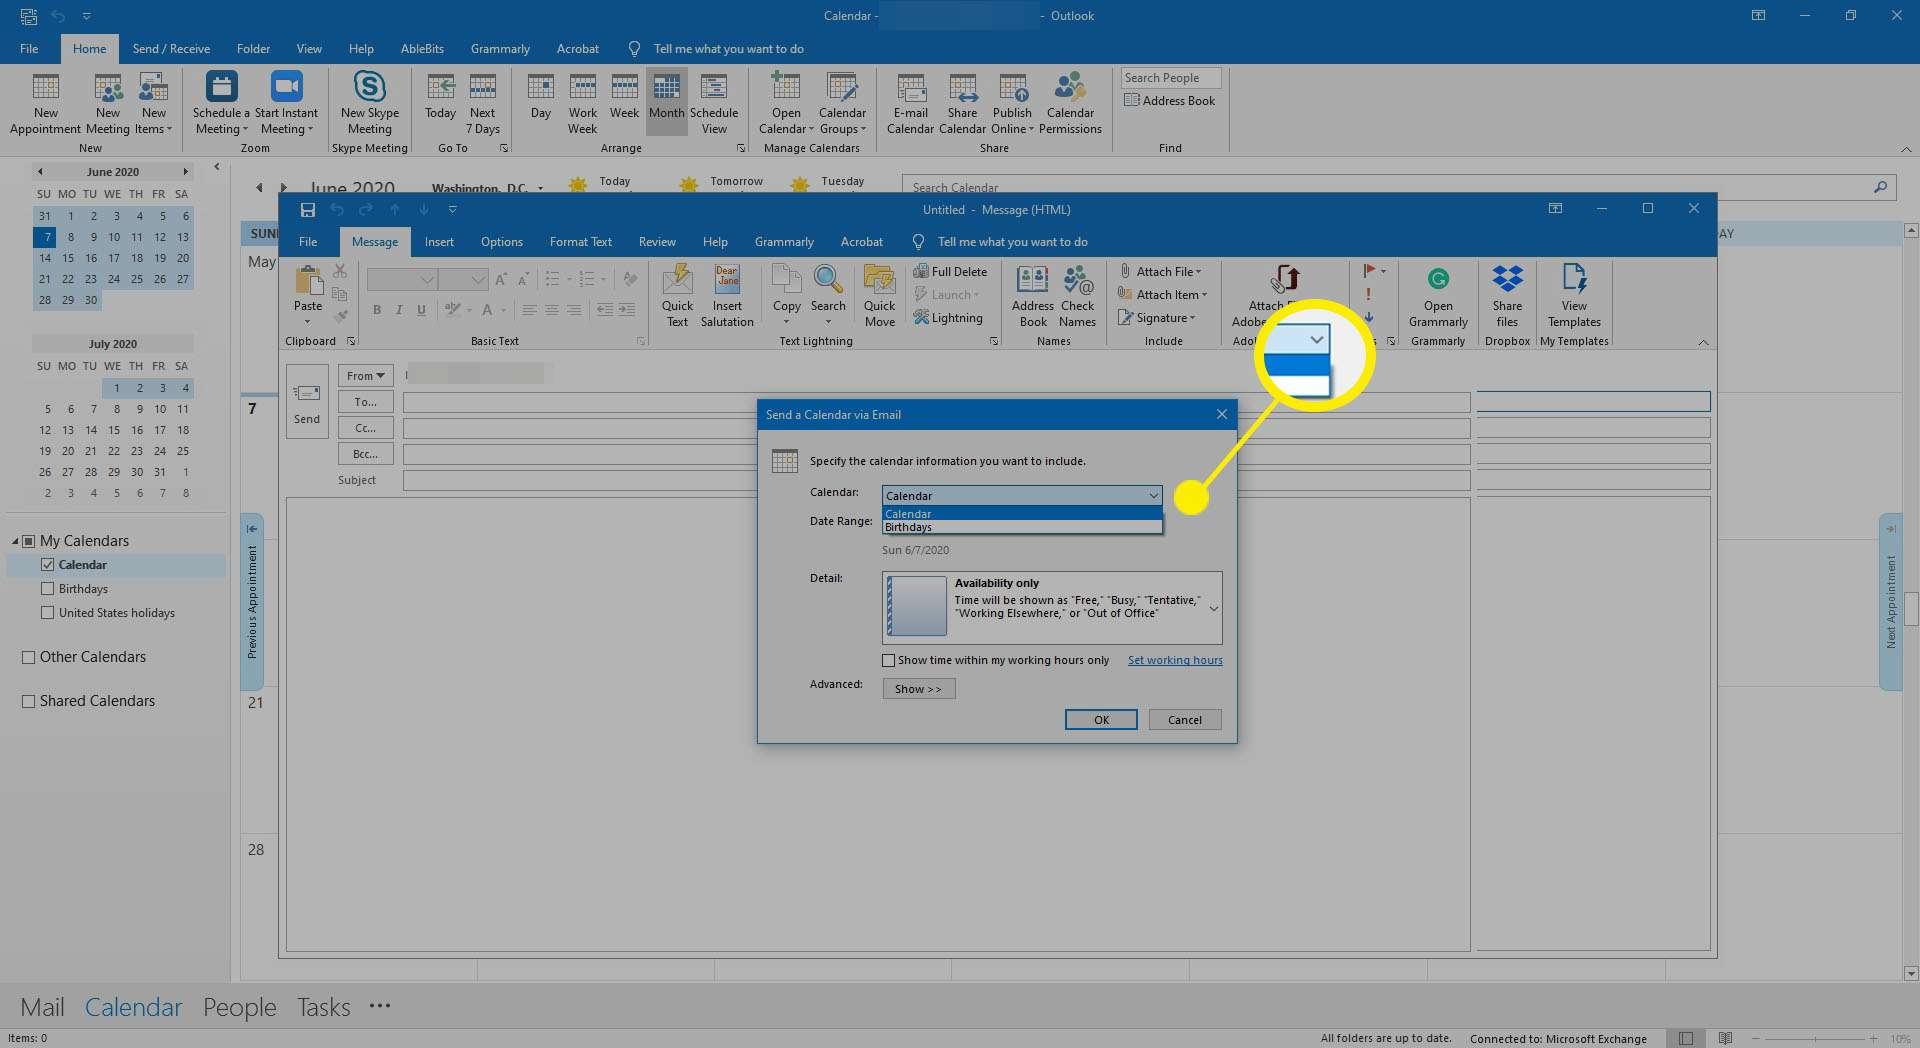 The send a calendar via email dialog in Outlook.